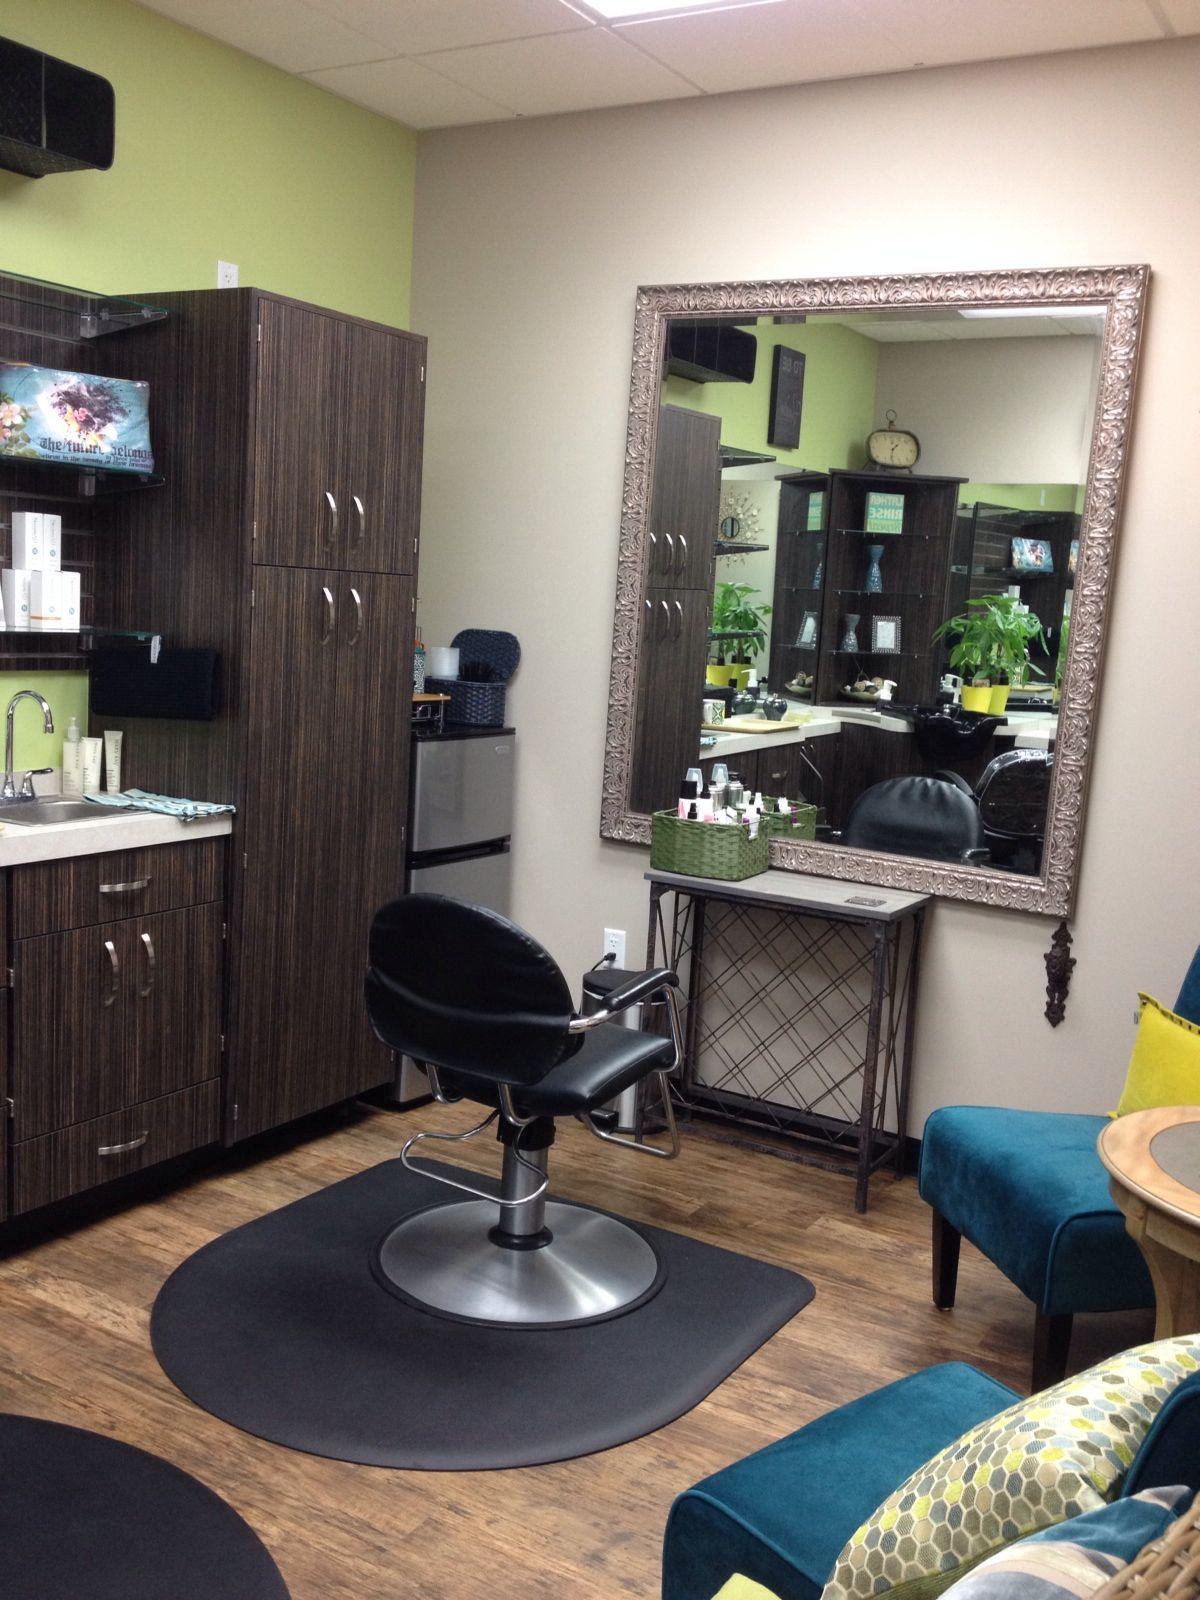 Pin By Rafael Terenci On Local Thairapy Salon Sola Salon Suites Decor Home Hair Salons Home Salon